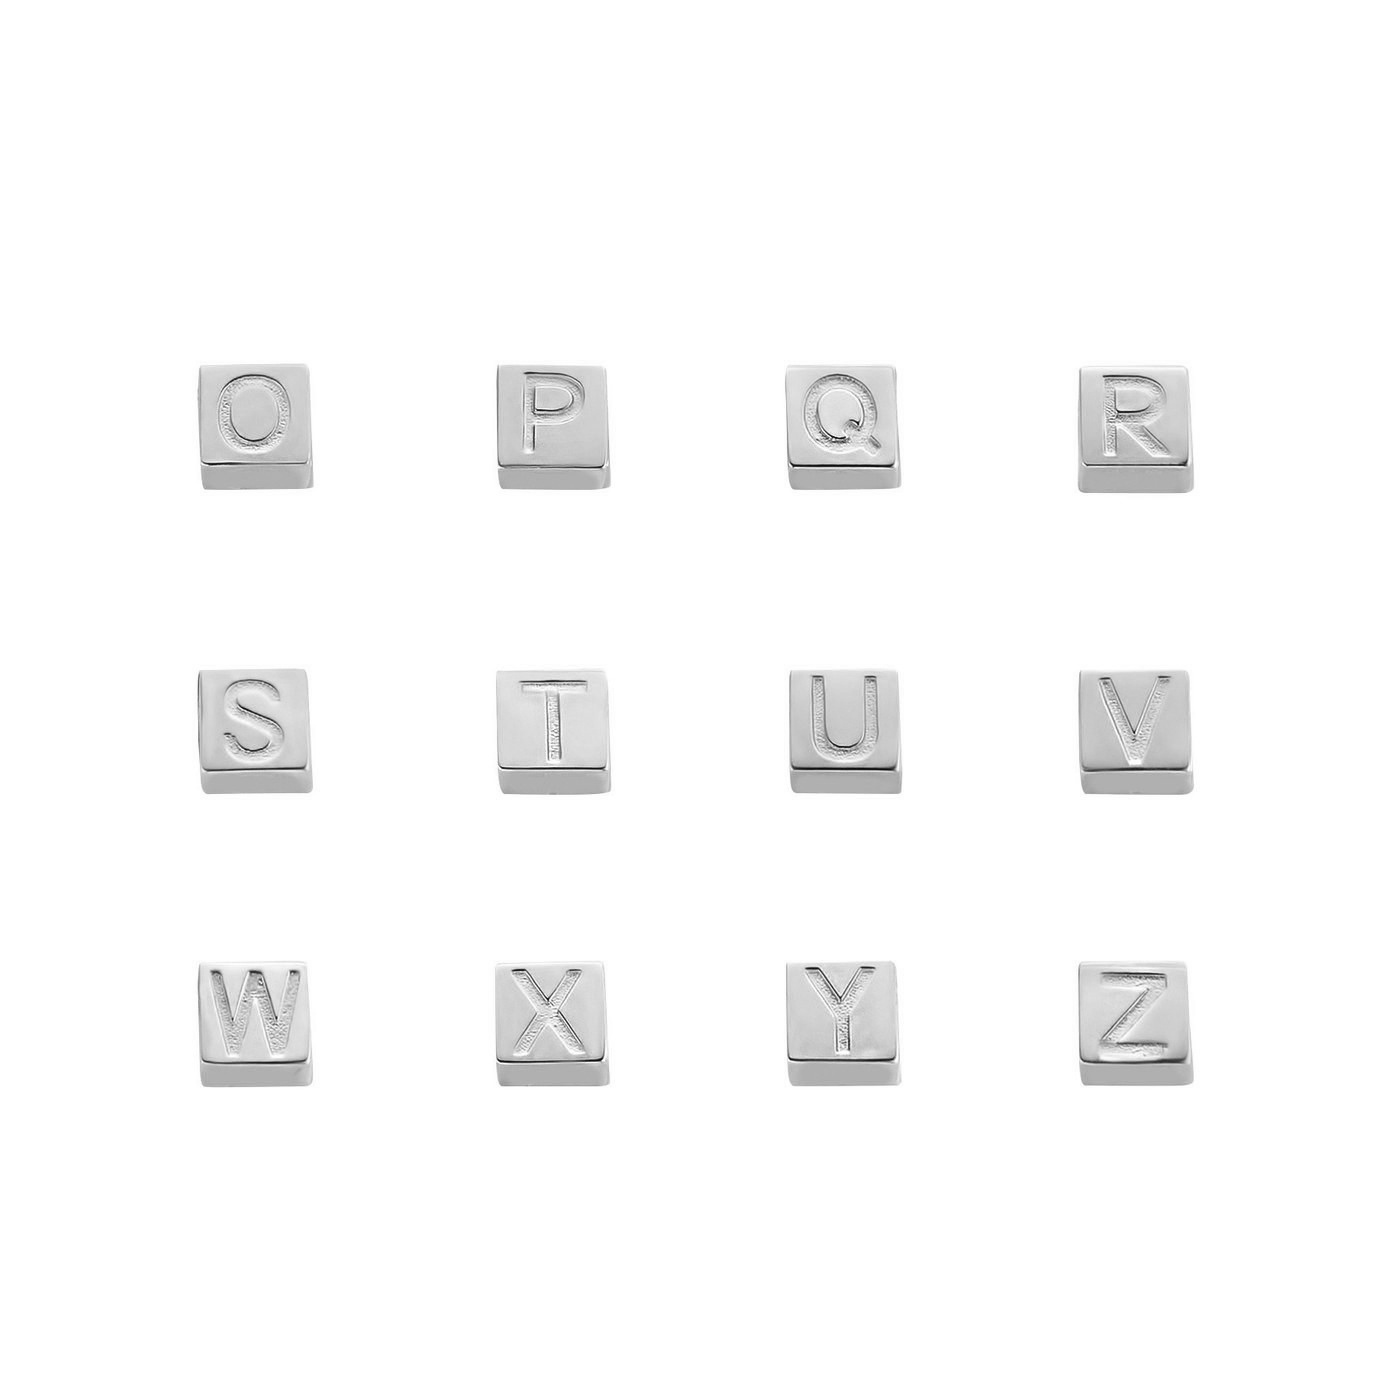 Isabel Bernard Saint Germain Felie 14 karat hvidguld kub initial charme